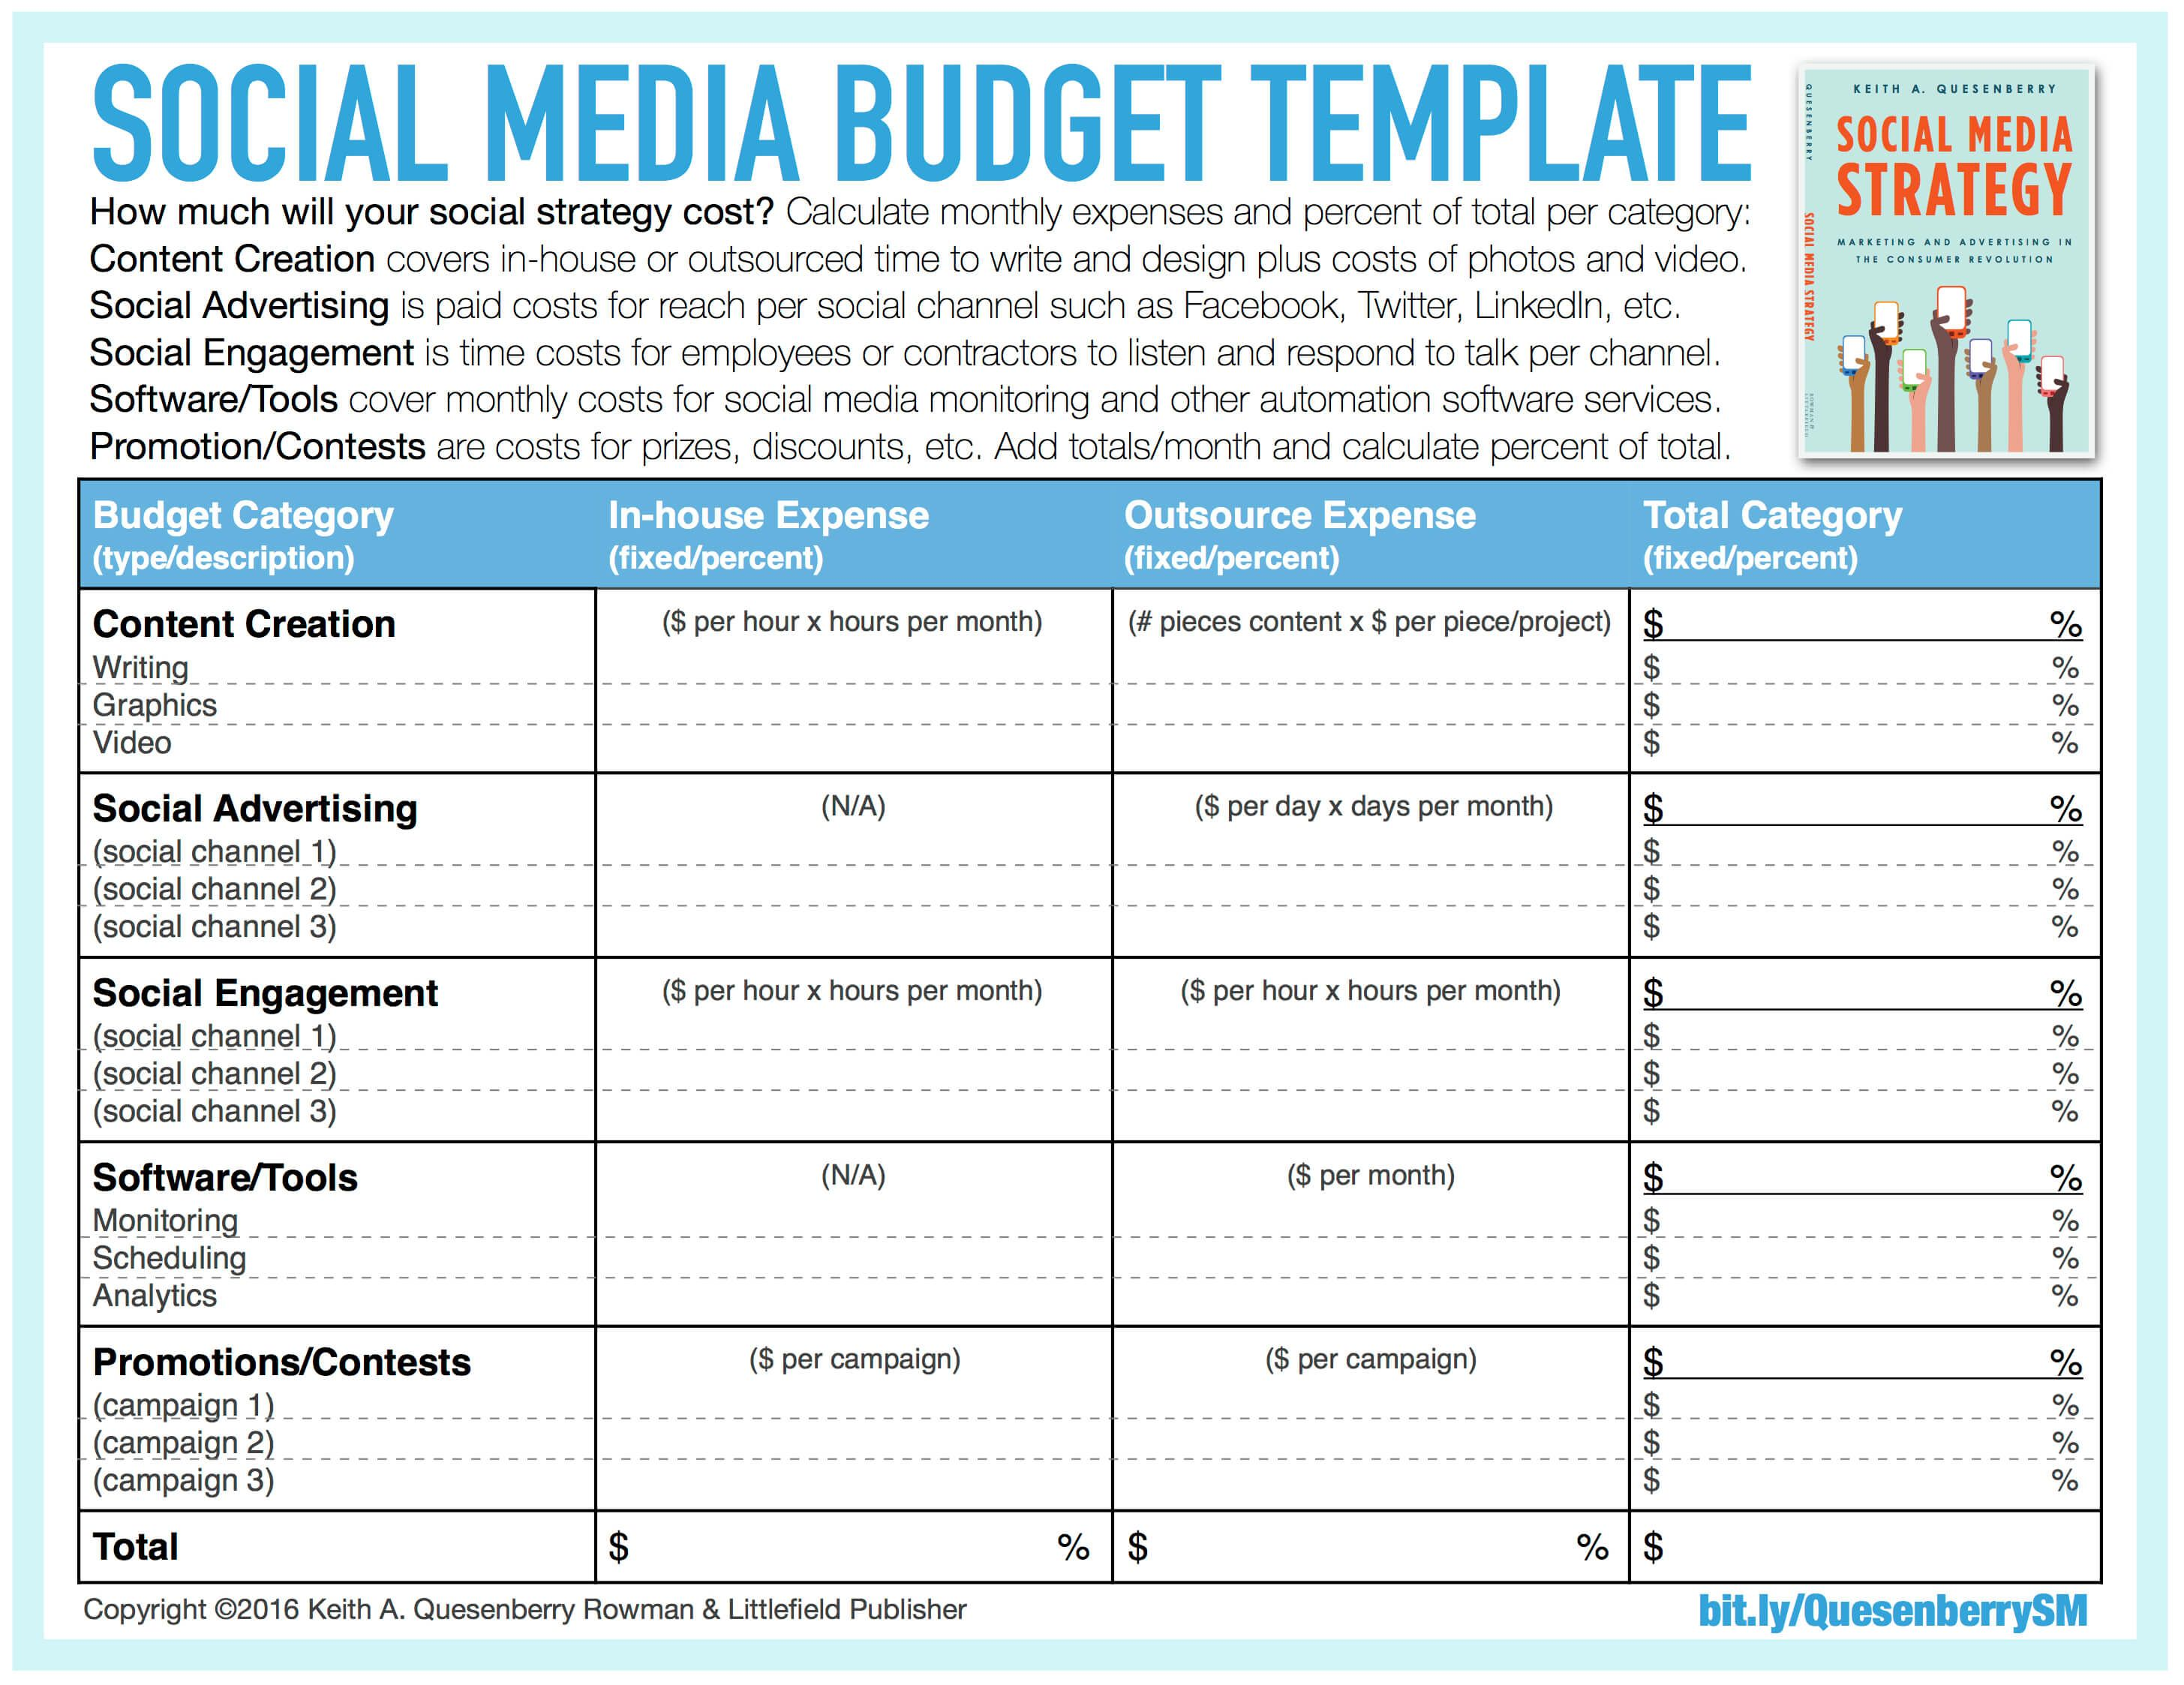 Free Social Media Budget Template | Big Data in 2019 | Social